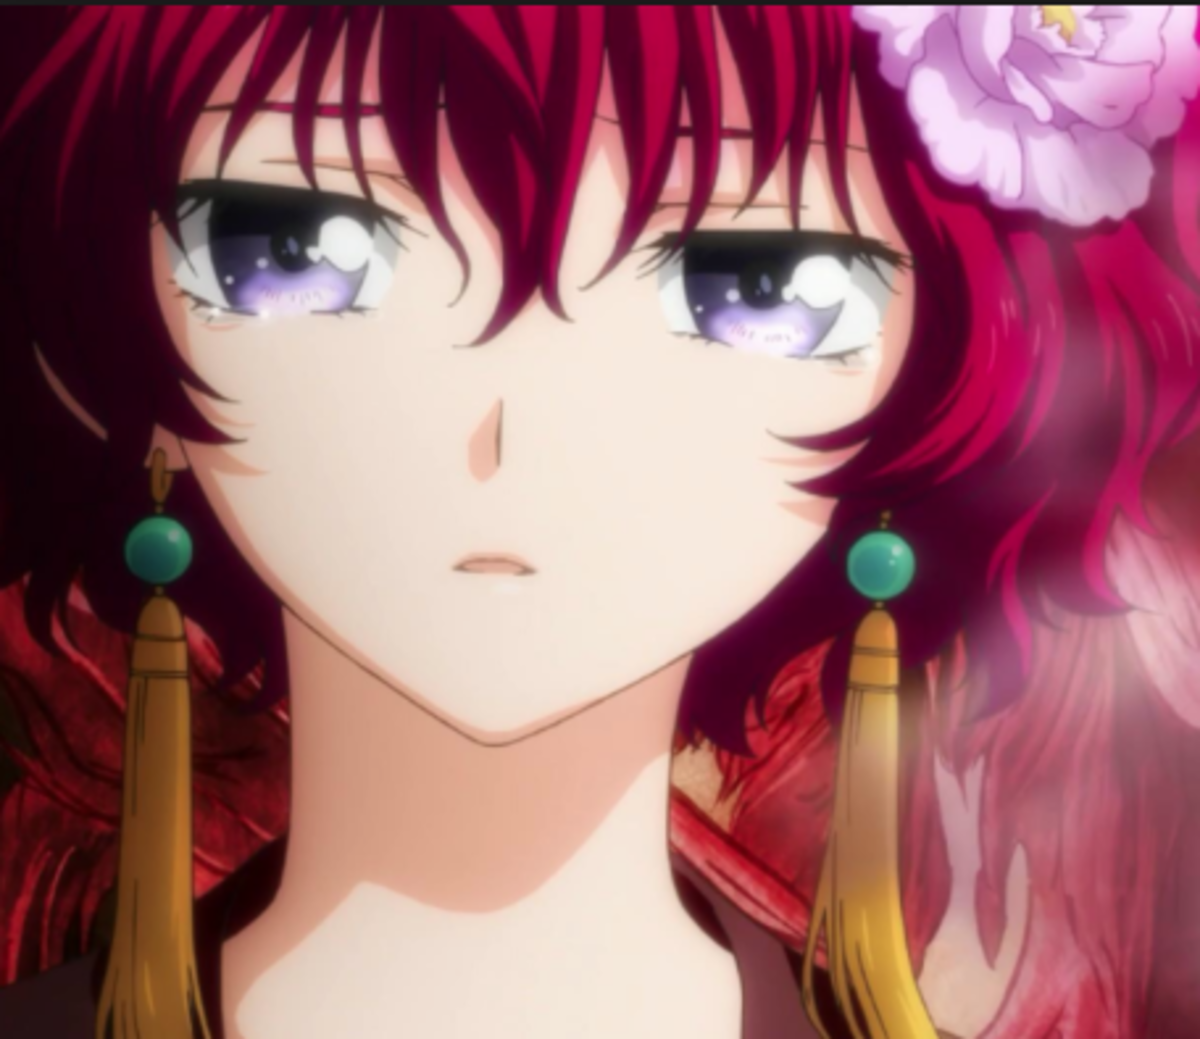 The Top 10 Shoujo Anime